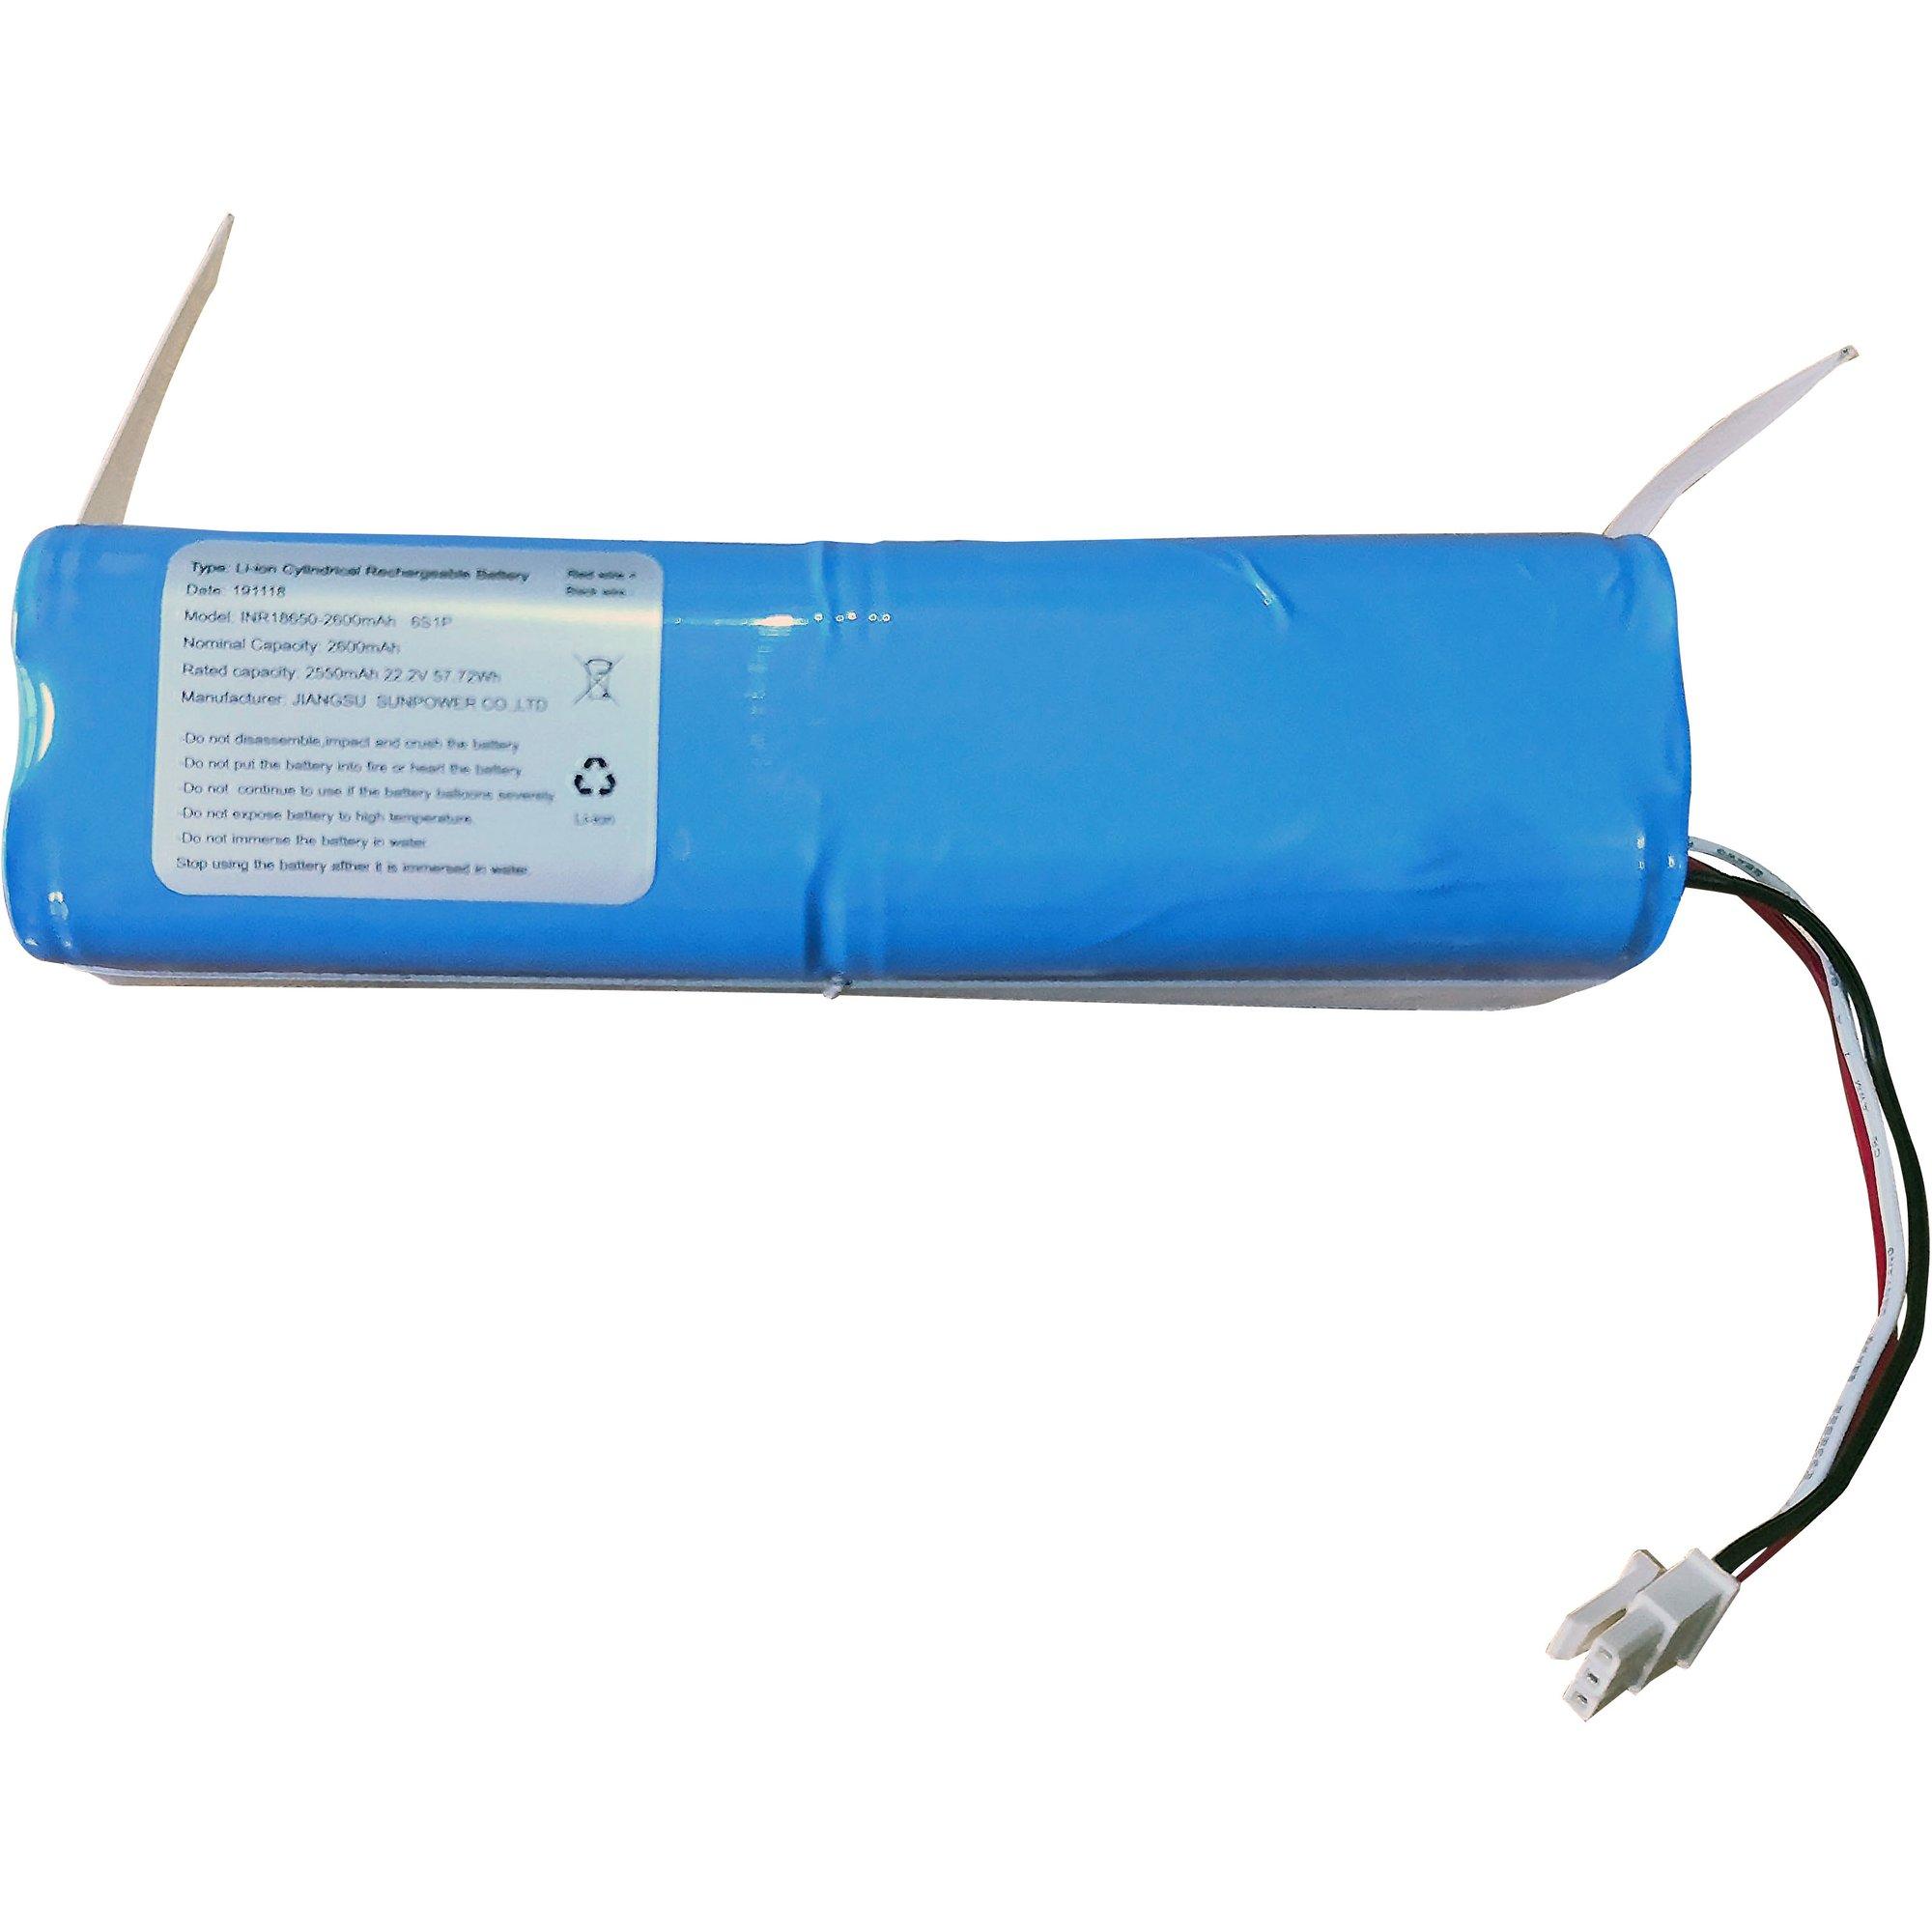 LawnExpert 5200 mAh Li-ion batteri